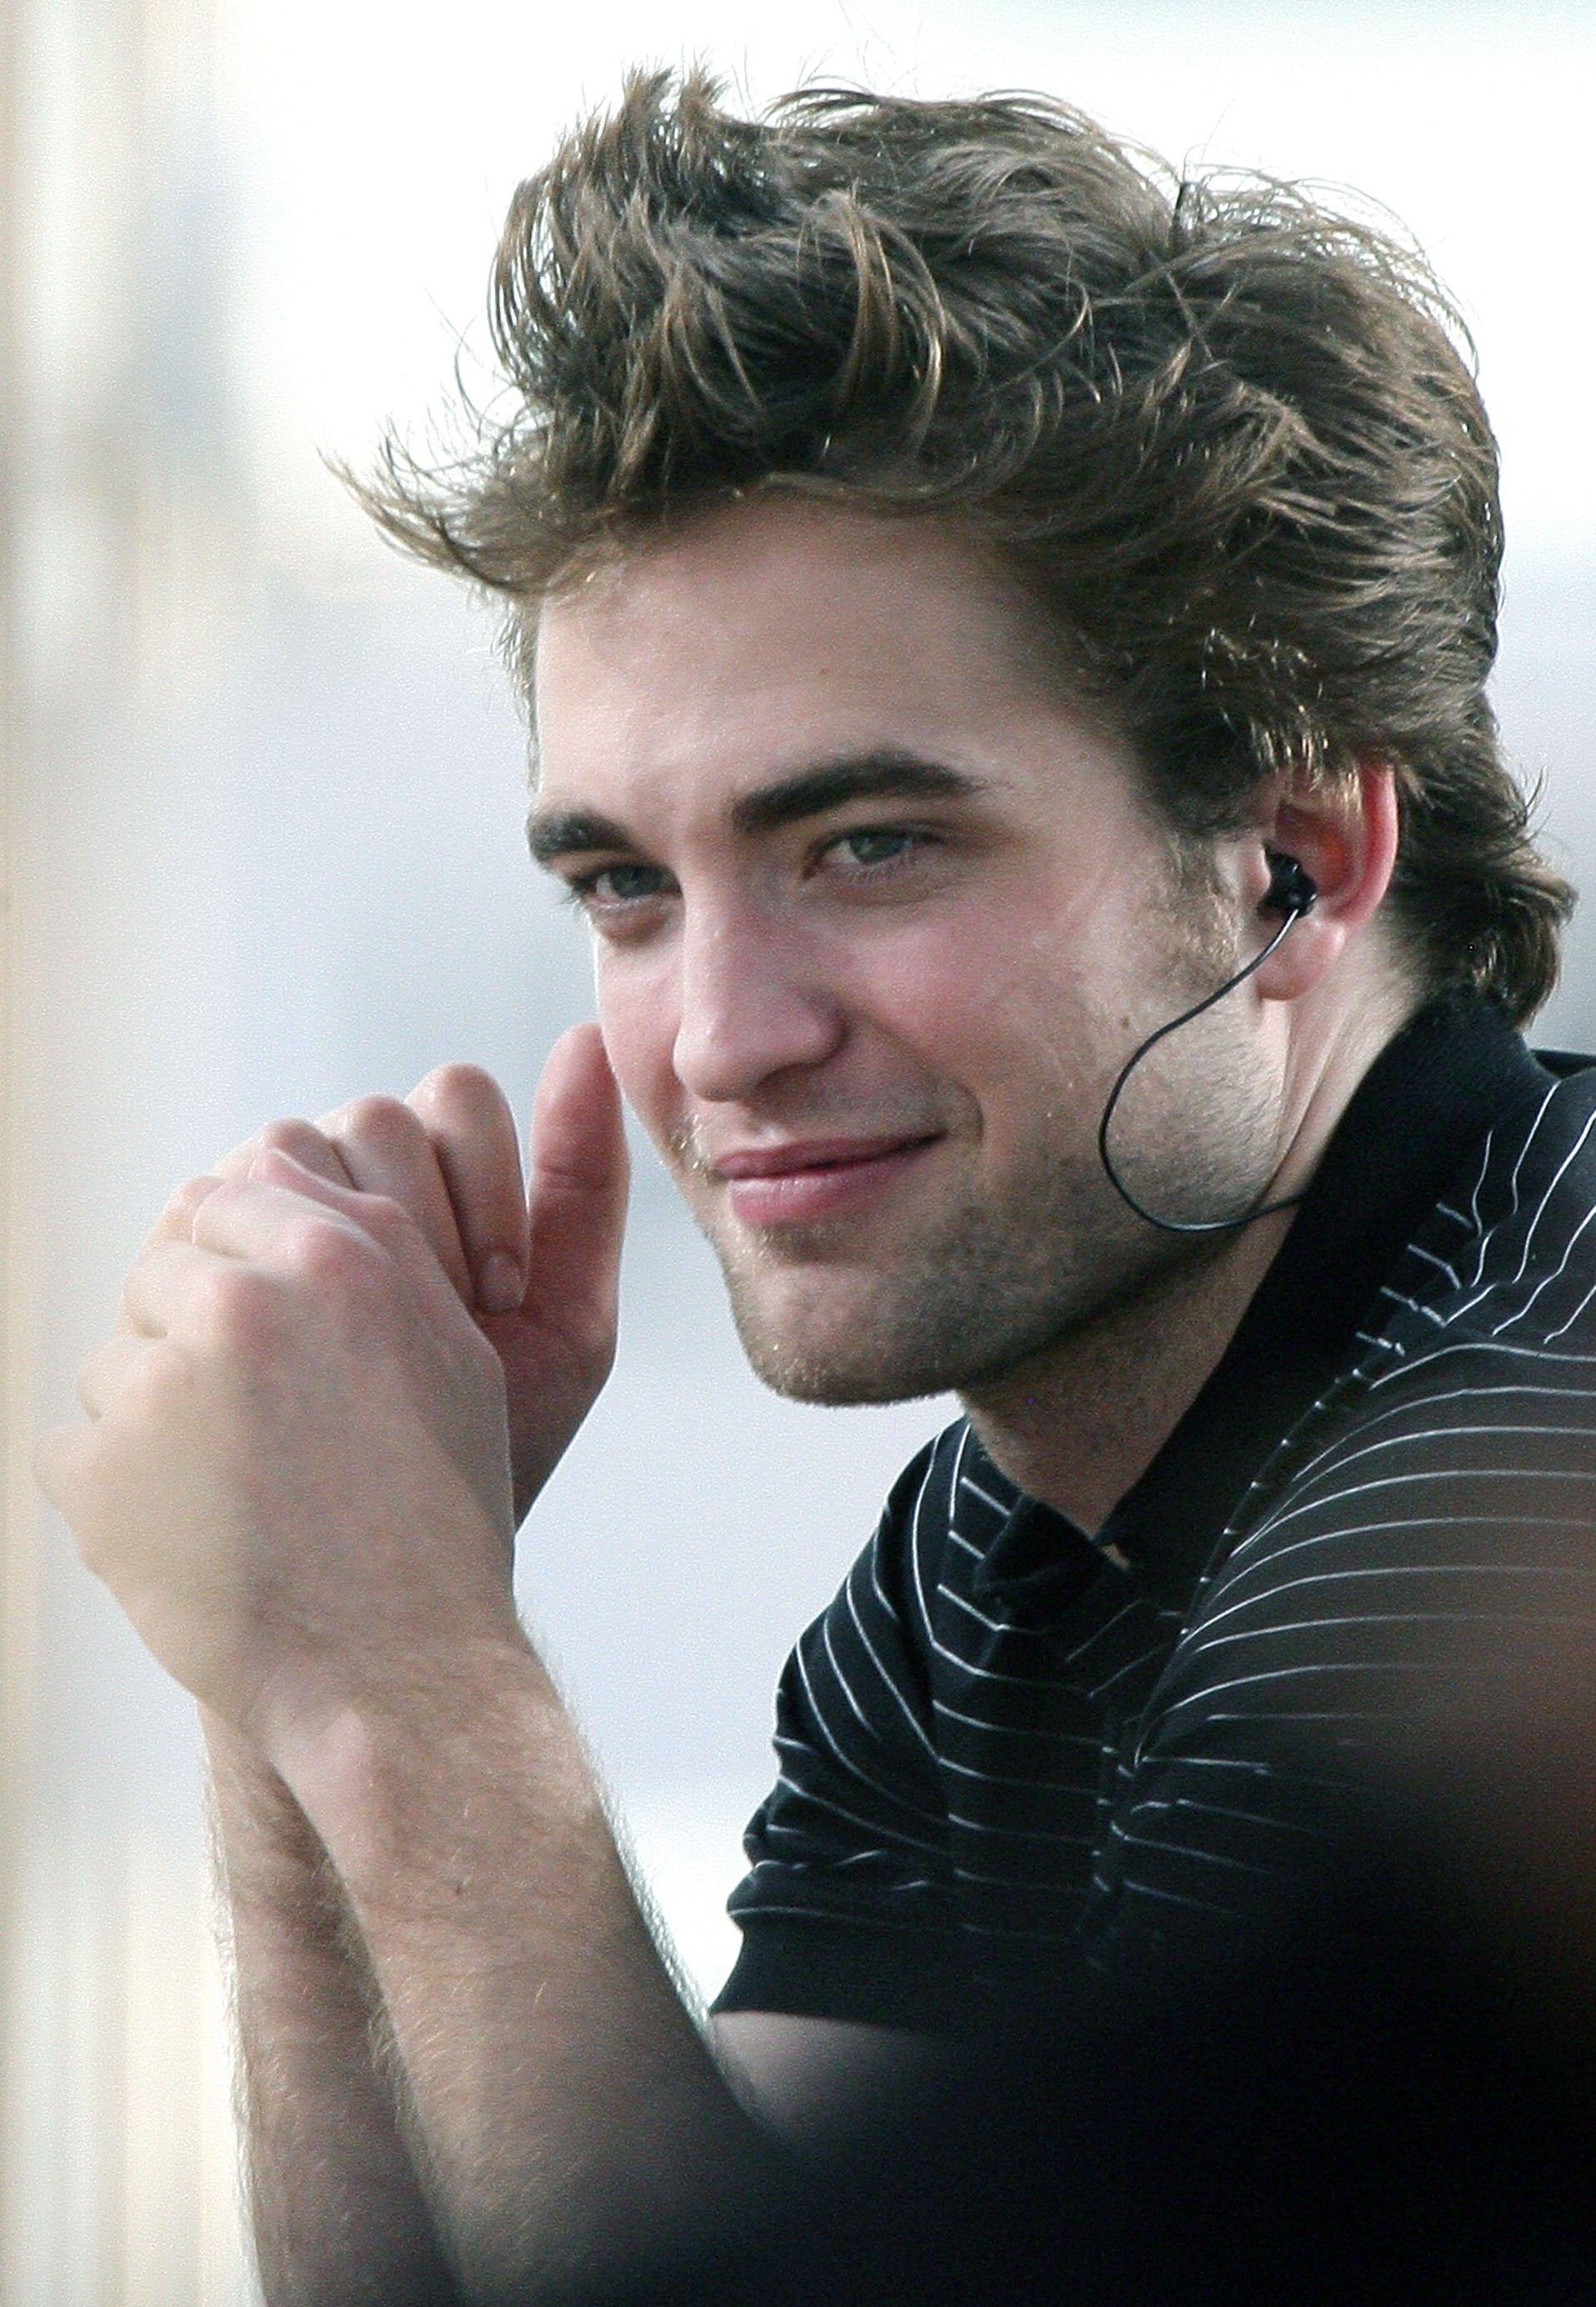 Gri Robert Pattinson Crepusculo Robert Pattinson Assistir